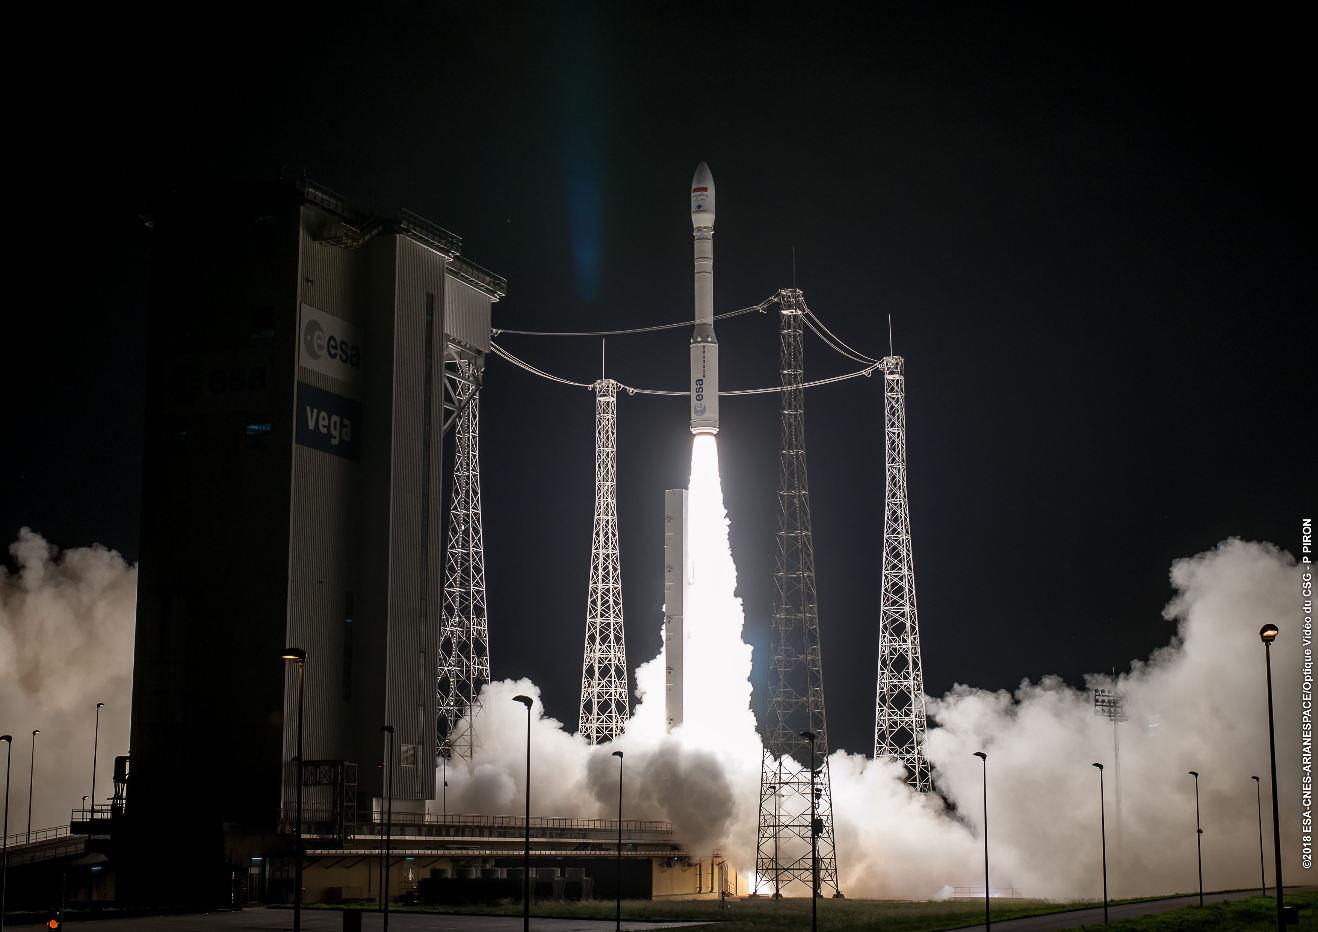 Arianespace launches Mohammed VI-B satellite on Vega